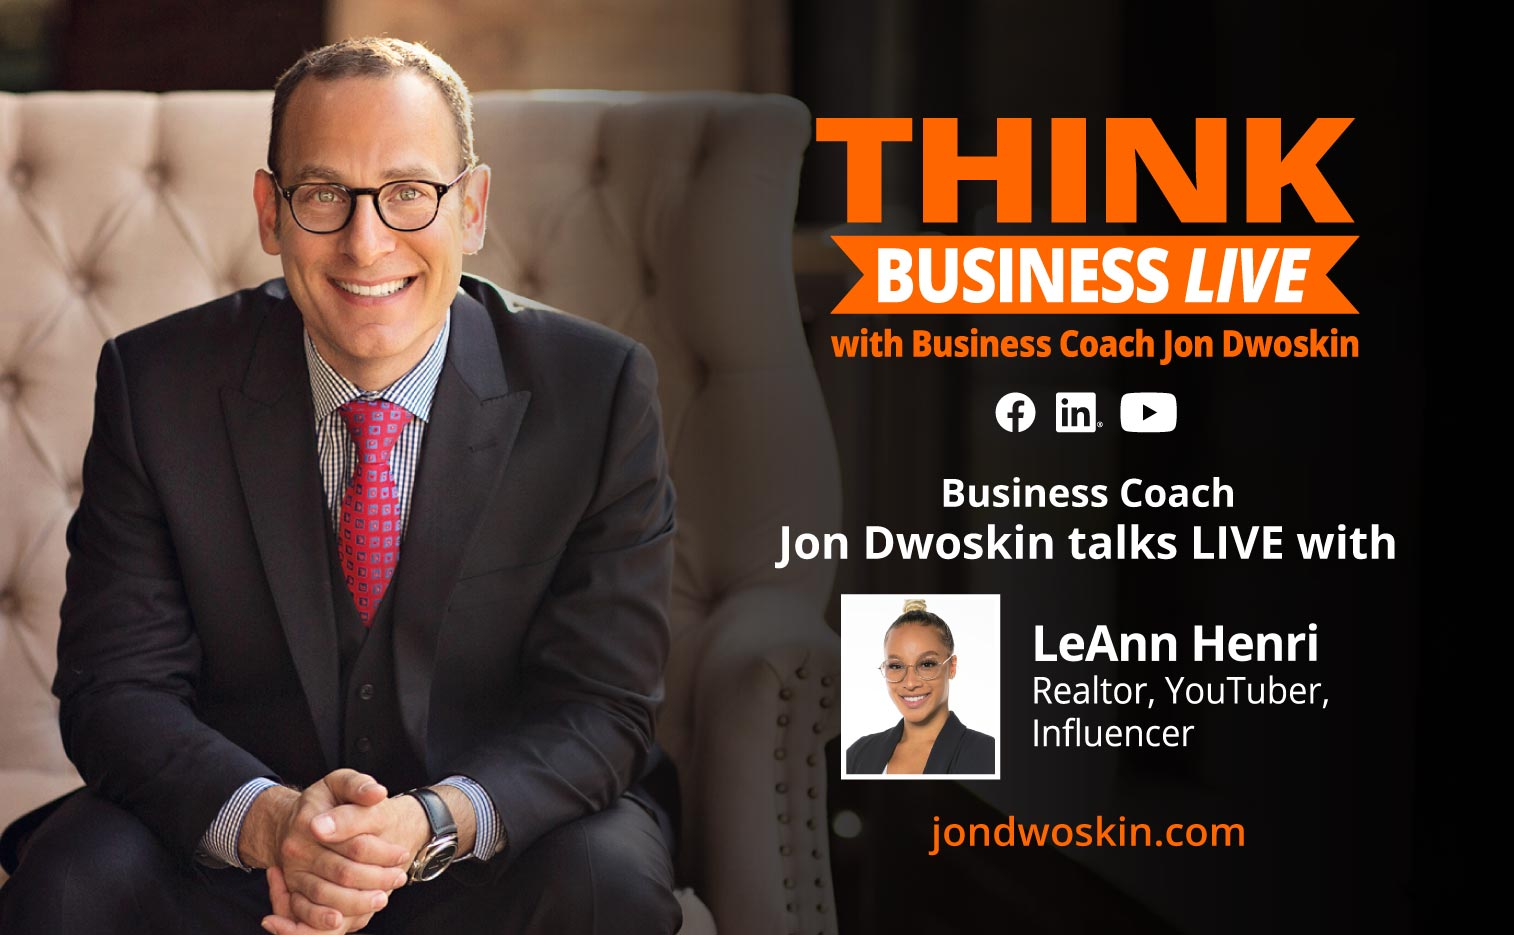 THINK Business LIVE: Jon Dwoskin Talks with LeAnn Henri